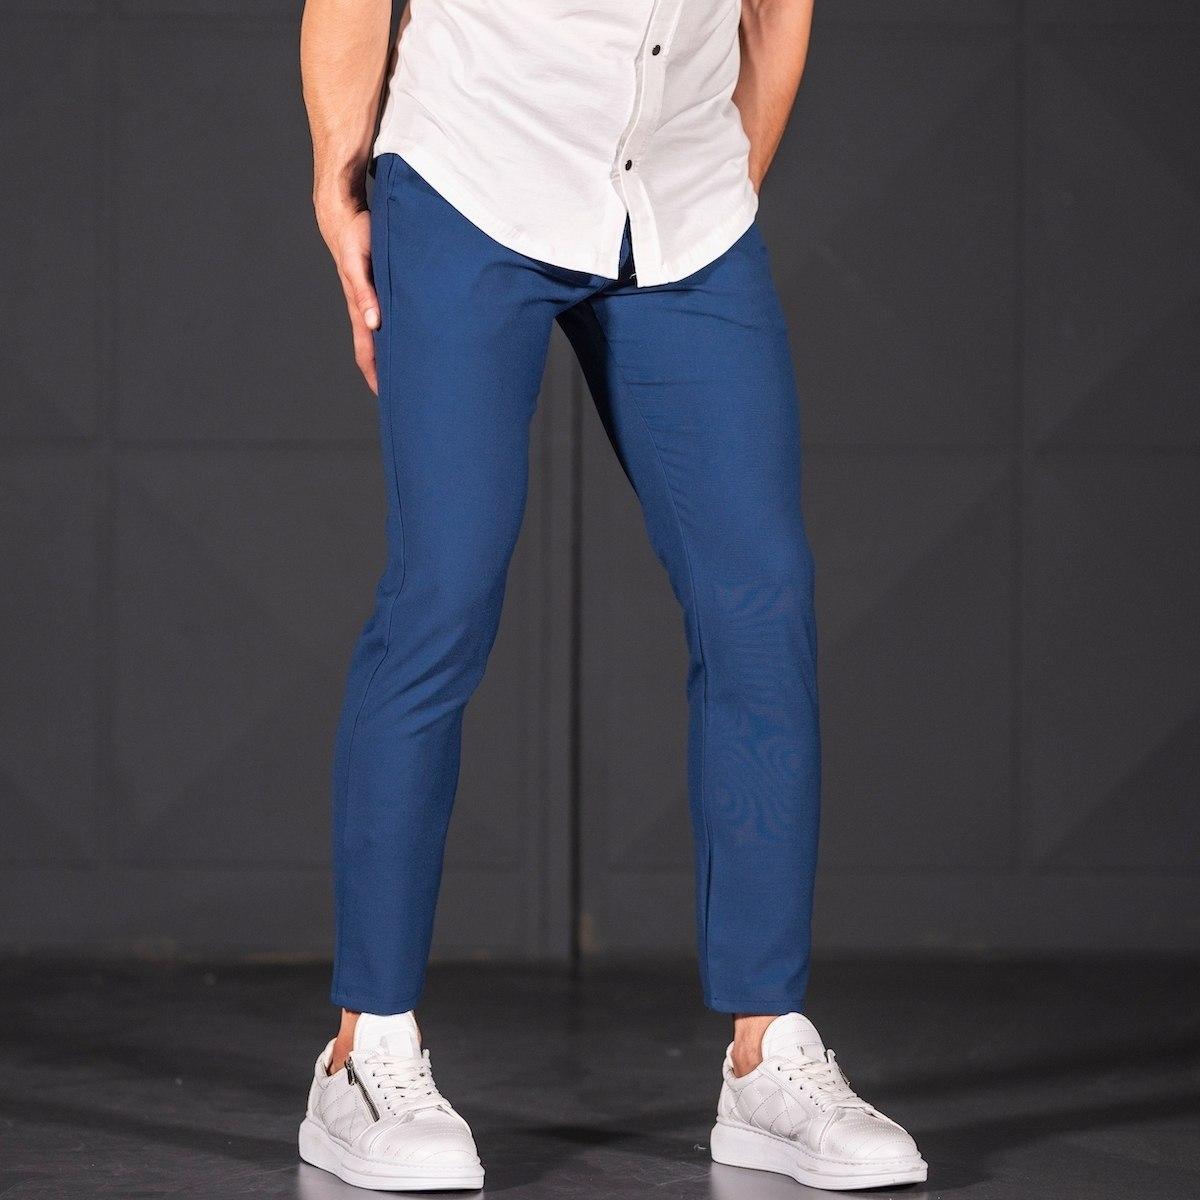 Modern Cut Trousers In Navy Blue Mv Premium Brand - 3